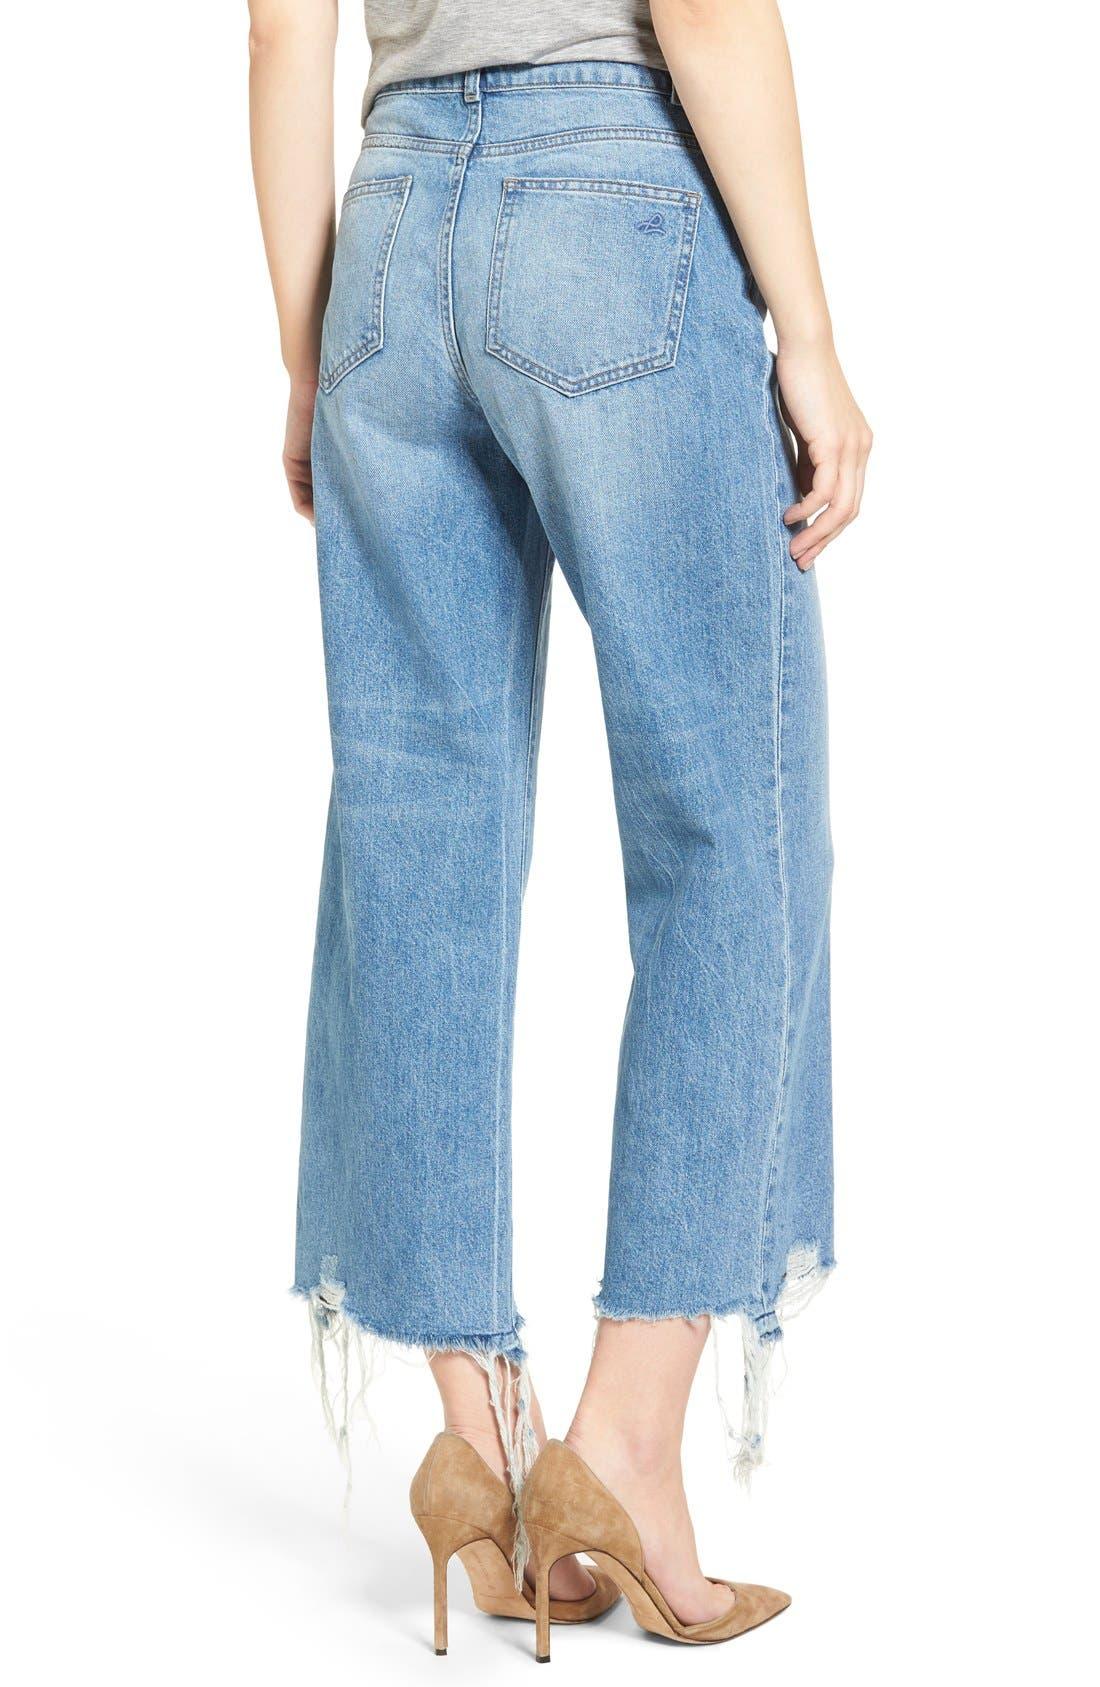 Hepburn High Rise Wide Leg Jeans,                             Alternate thumbnail 4, color,                             425